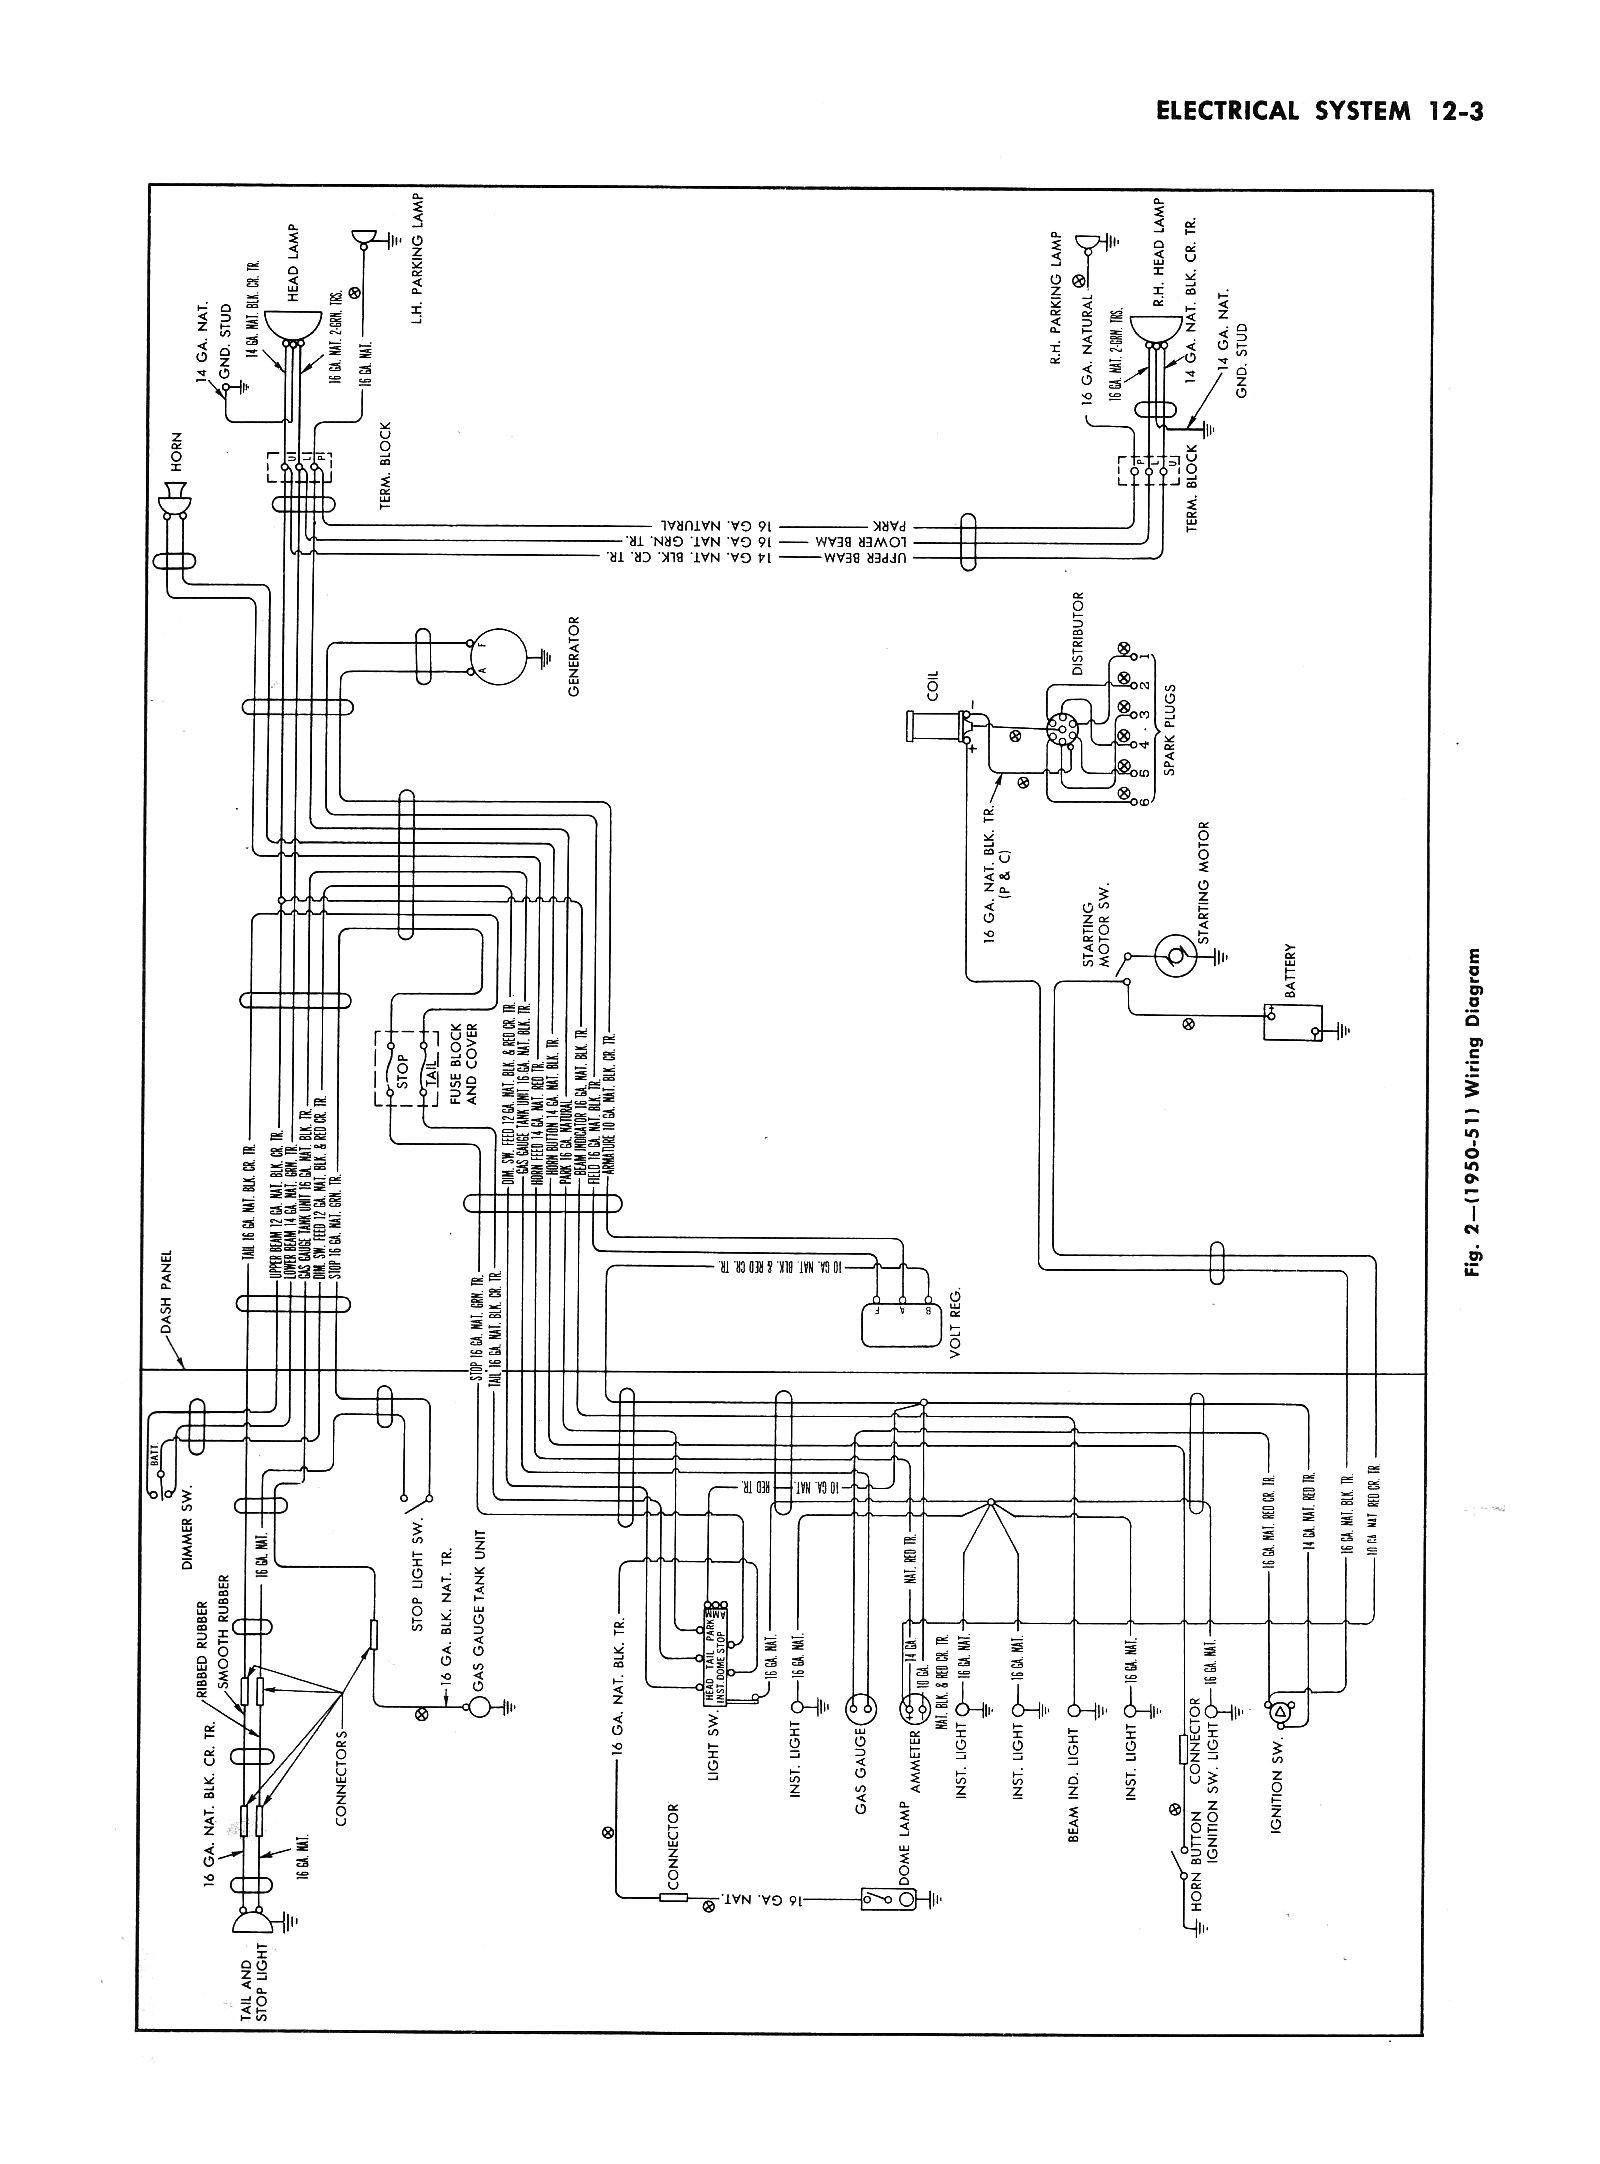 Honda Ridgeline Electrical Schematic. Honda. Auto Wiring